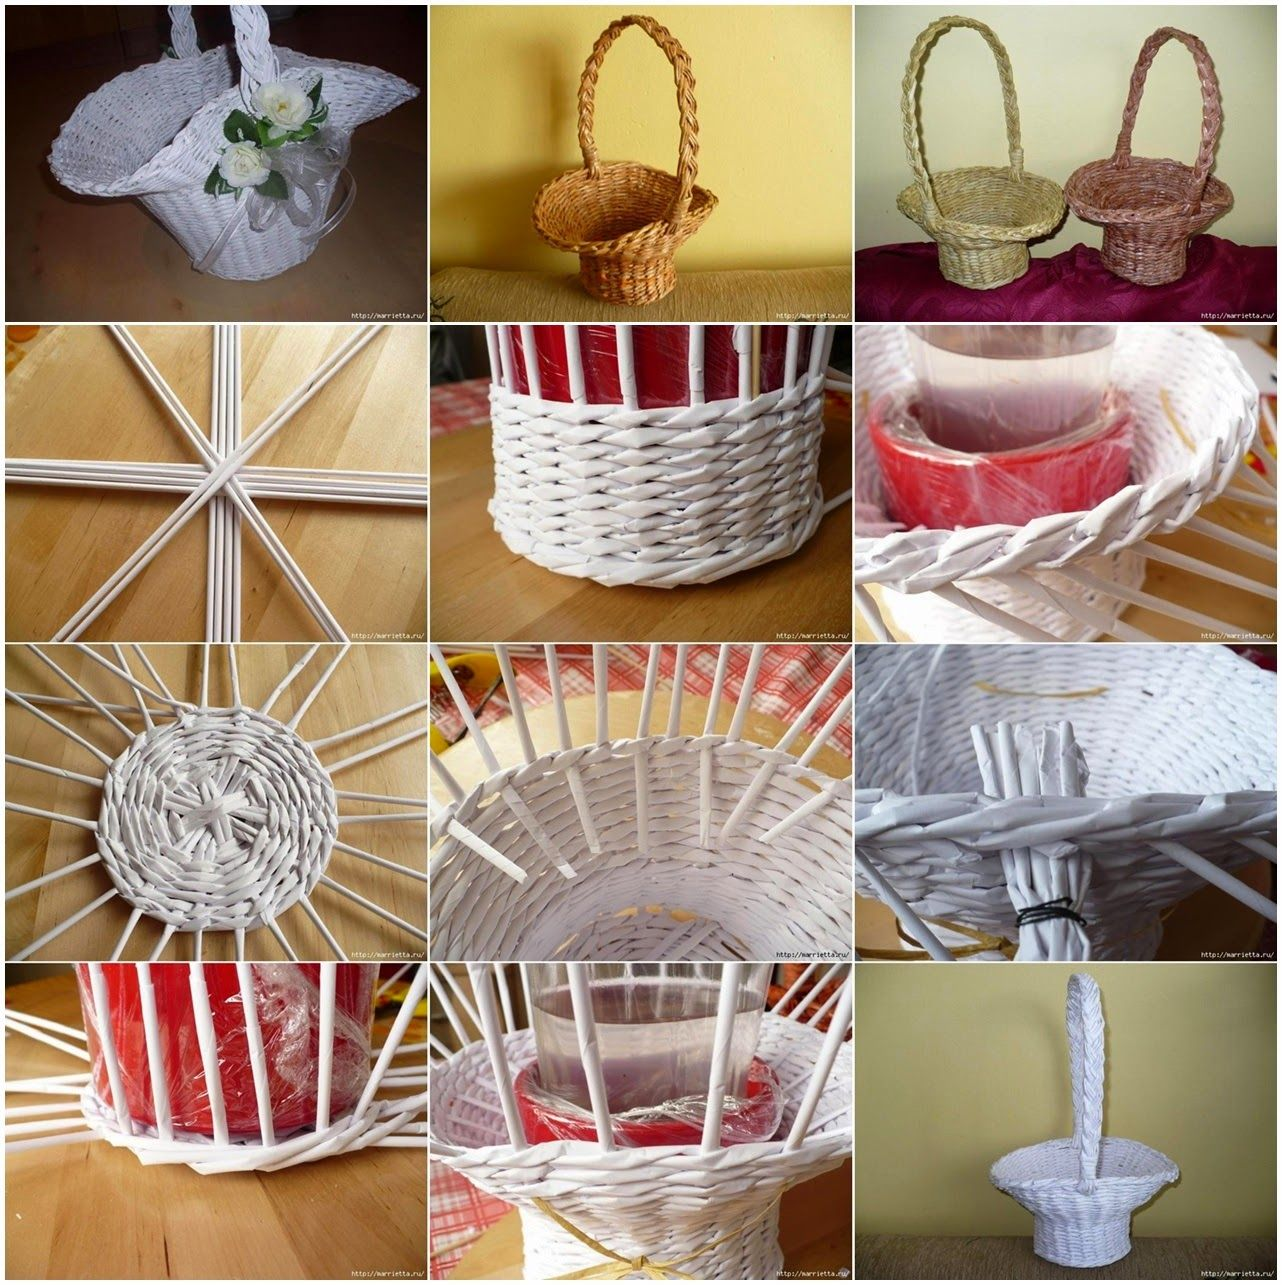 DIY Newspaper Flower Basket Tutorial O All In One